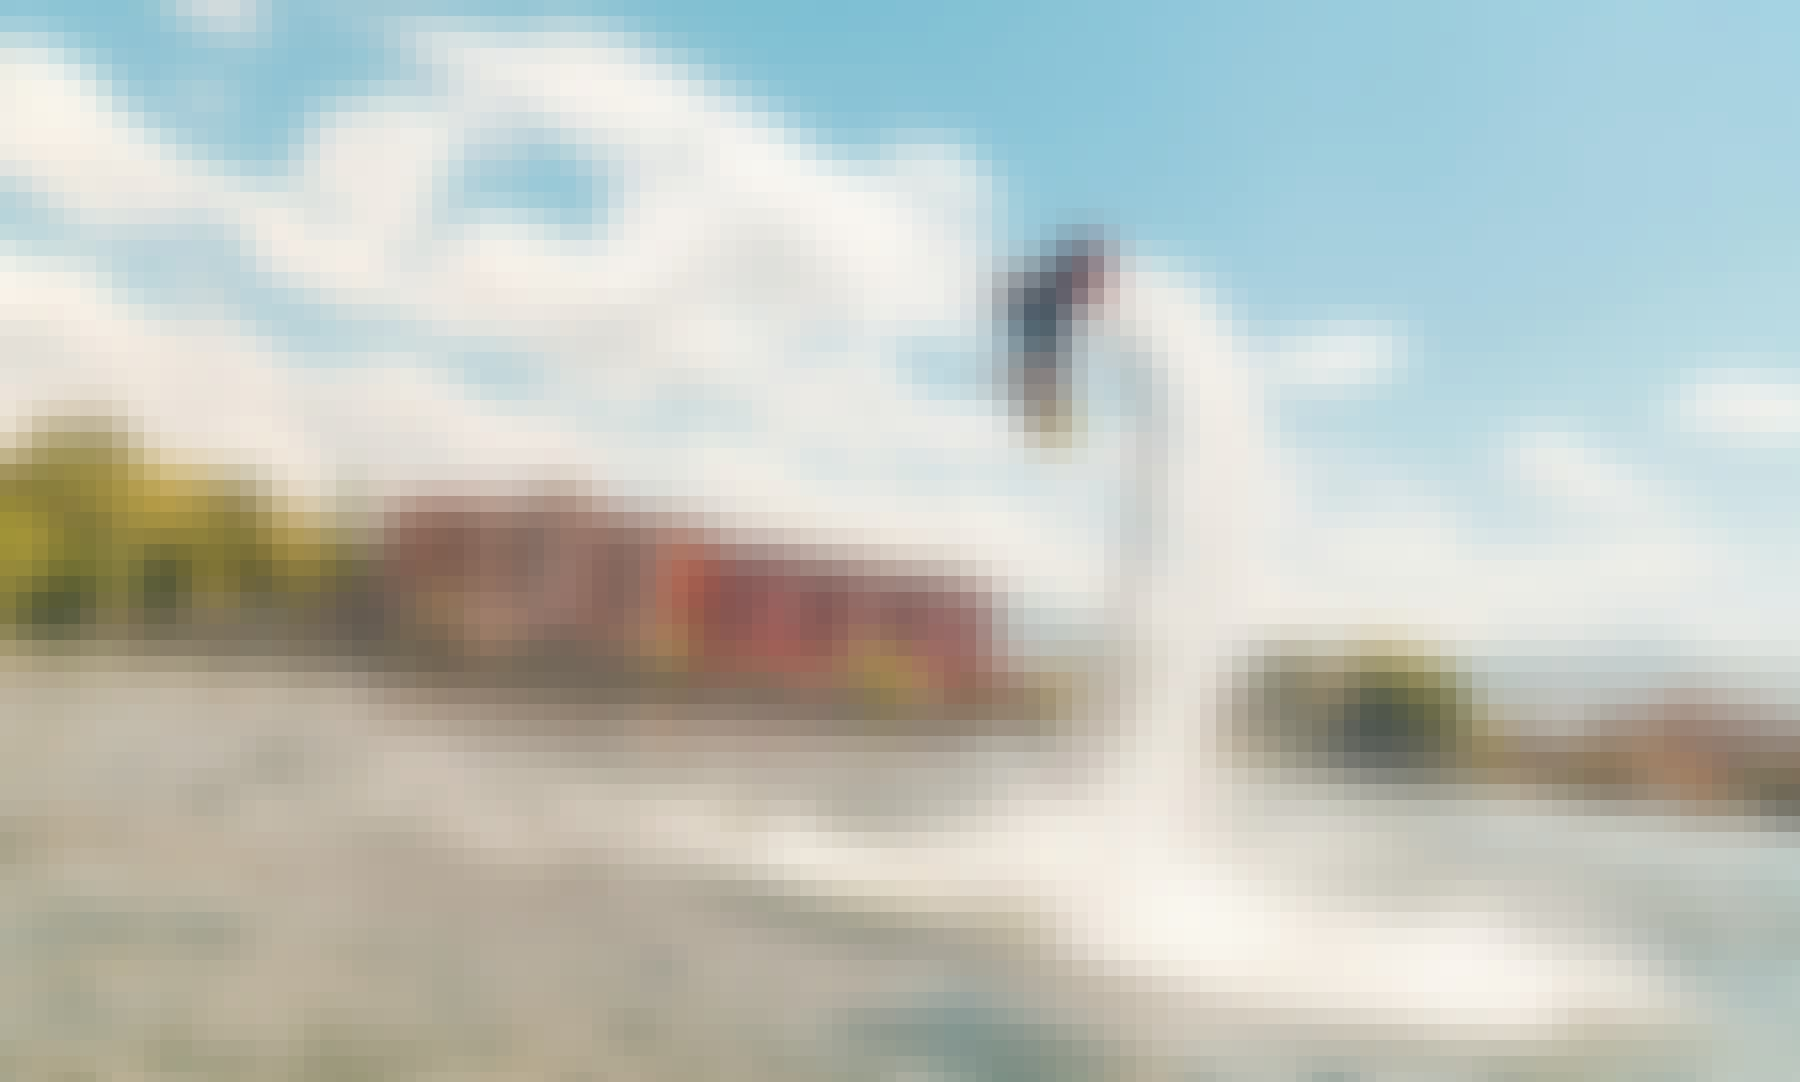 Iron Man Flyboard Experience in Kelowna, Canada